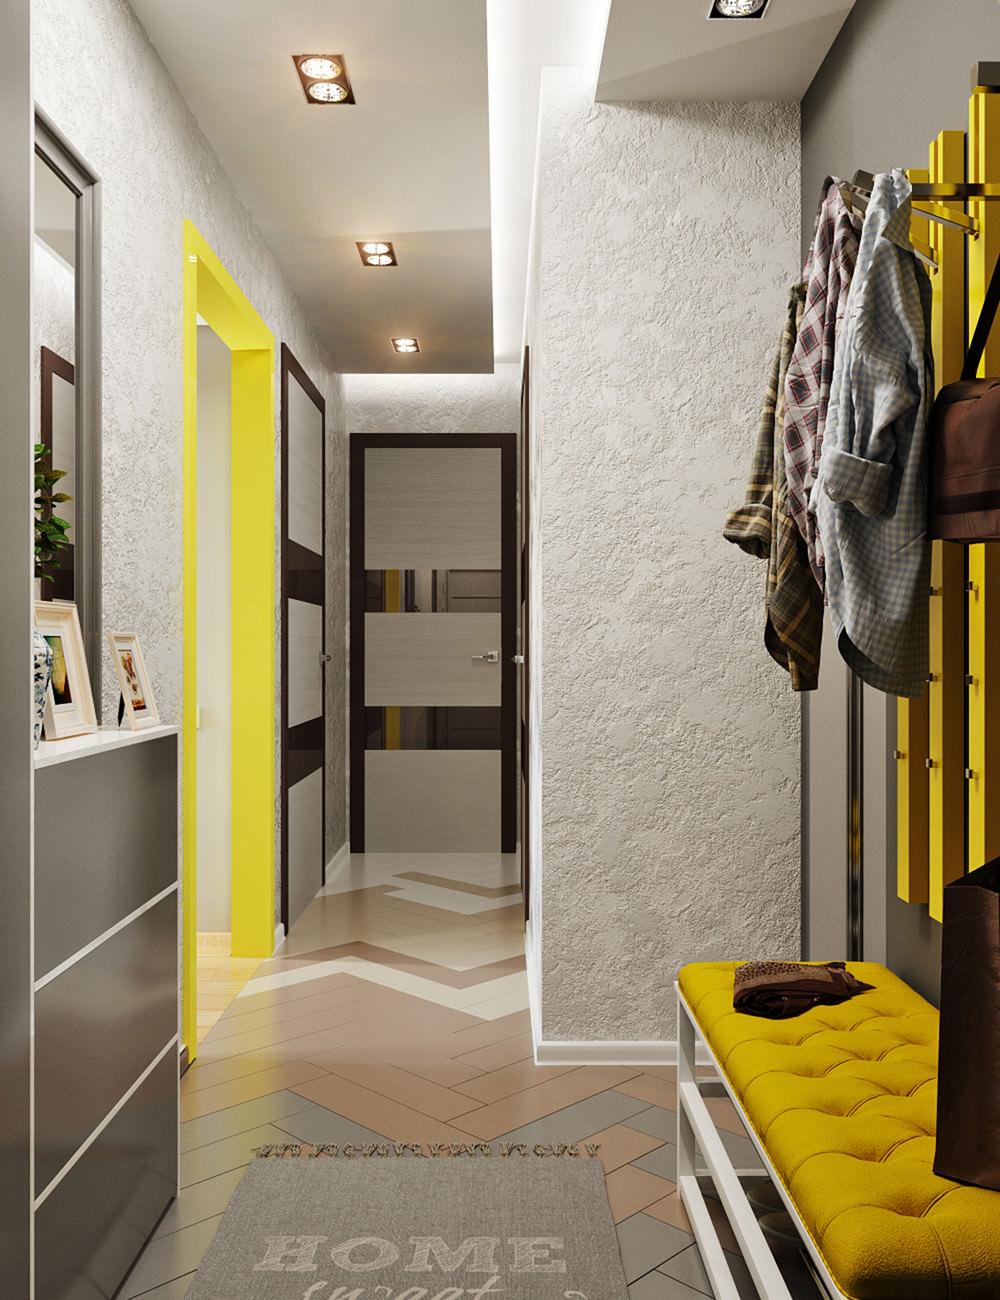 interioren-dizain-s-harakter-edin-moderen-apartament-7g